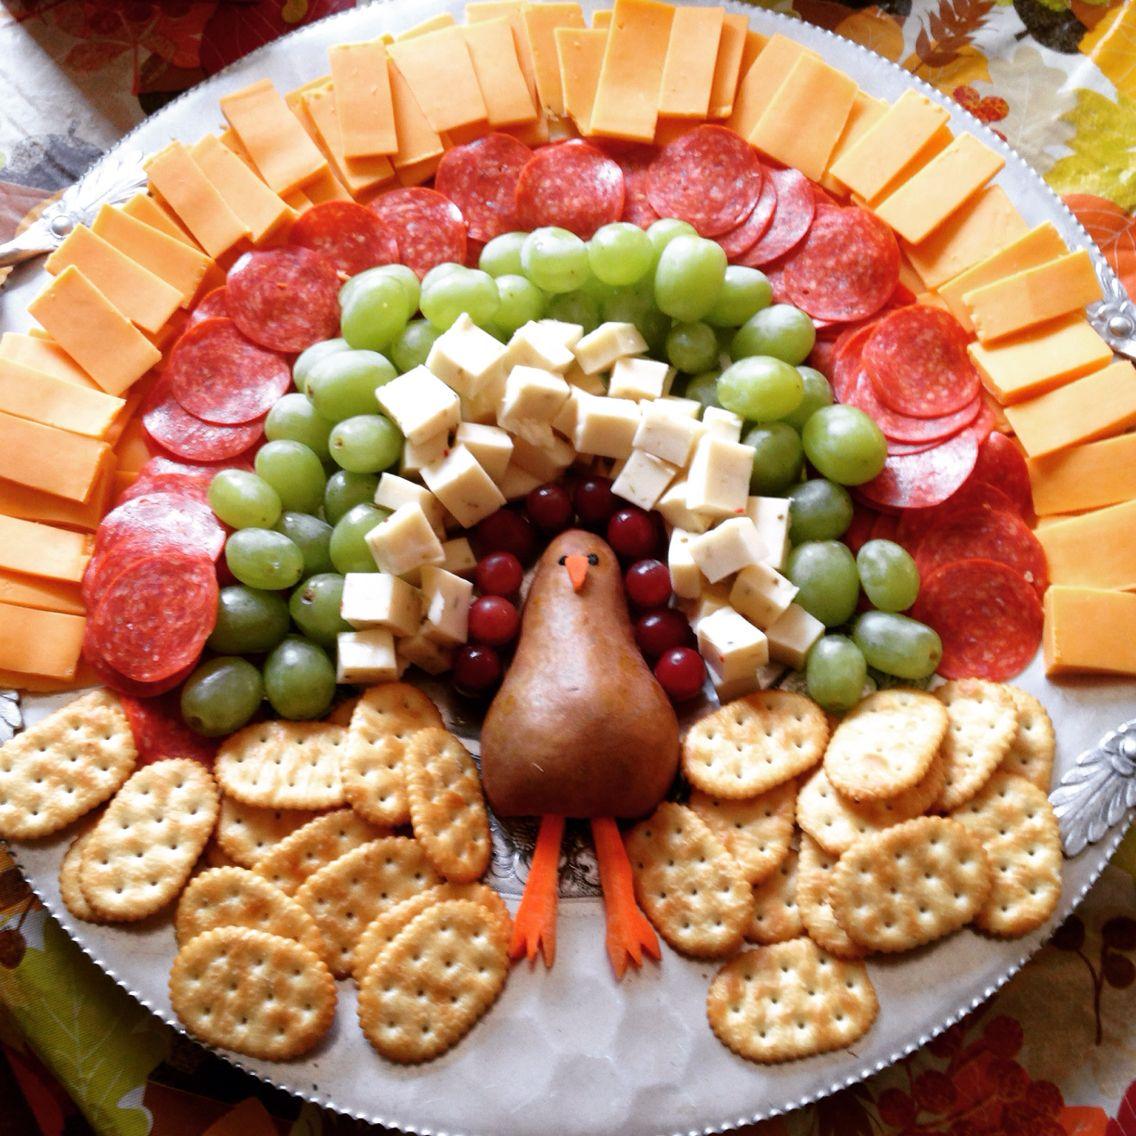 Meat & Cheese Turkey Tray #thanksgivingappetizersideas